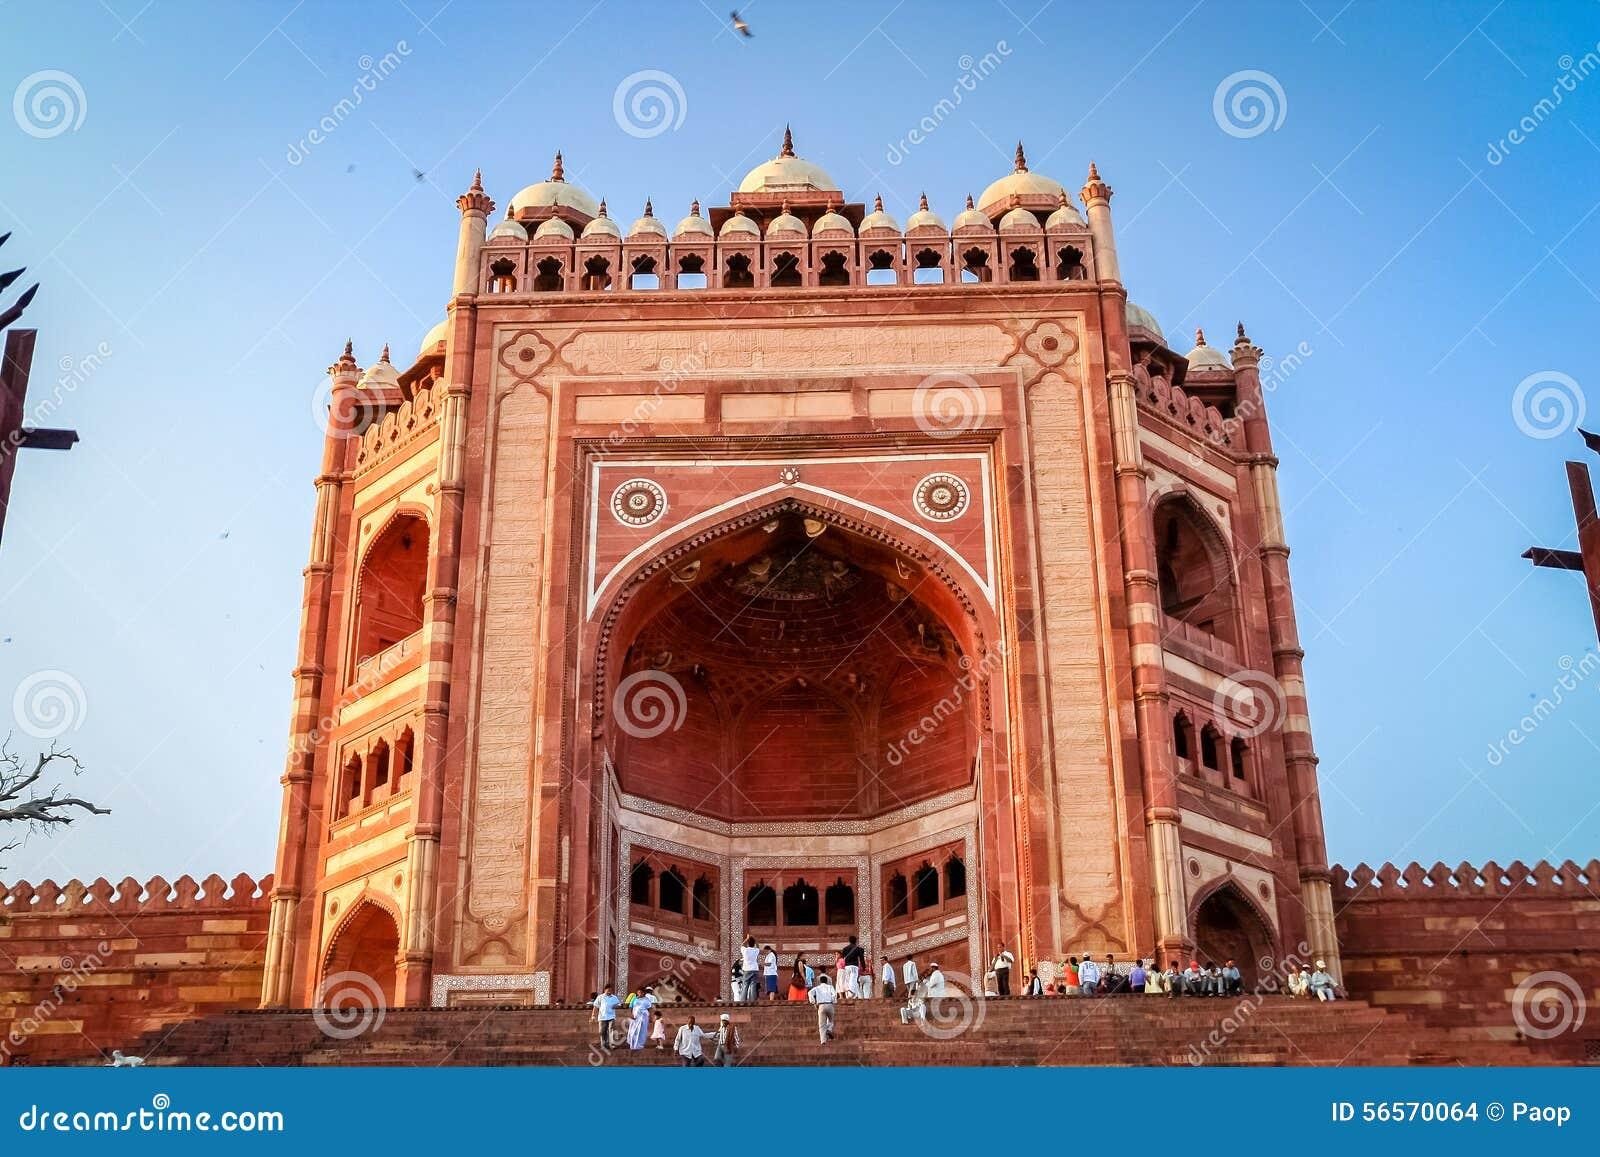 Download Fatehpur Sikri εκδοτική στοκ εικόνα. εικόνα από εντυπωσιακός - 56570064